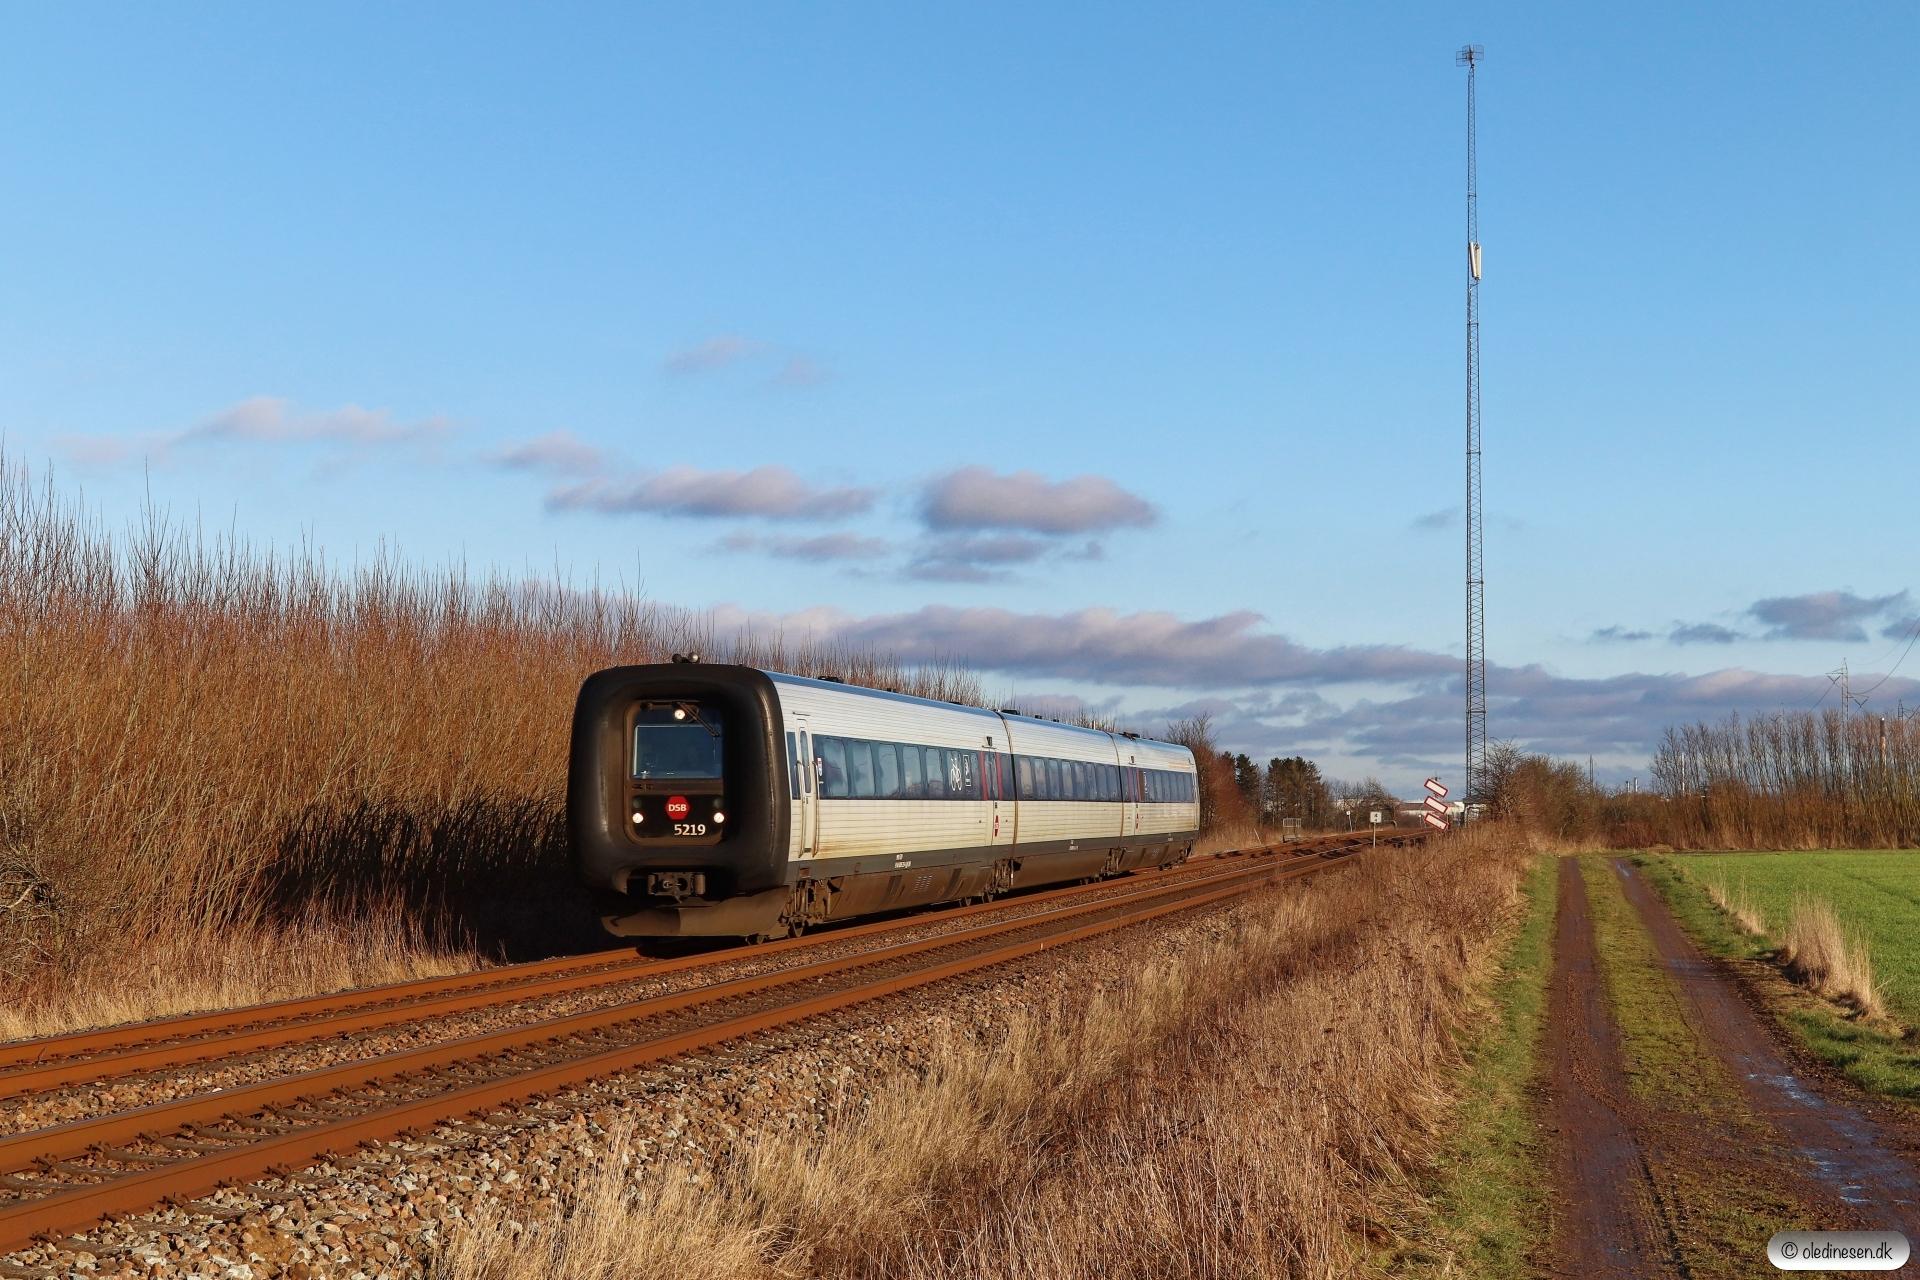 DSB MF 19 som IC 145 Kh-Ab. Km 4,4 Fa (Fredericia-Børkop) 28.01.2021.